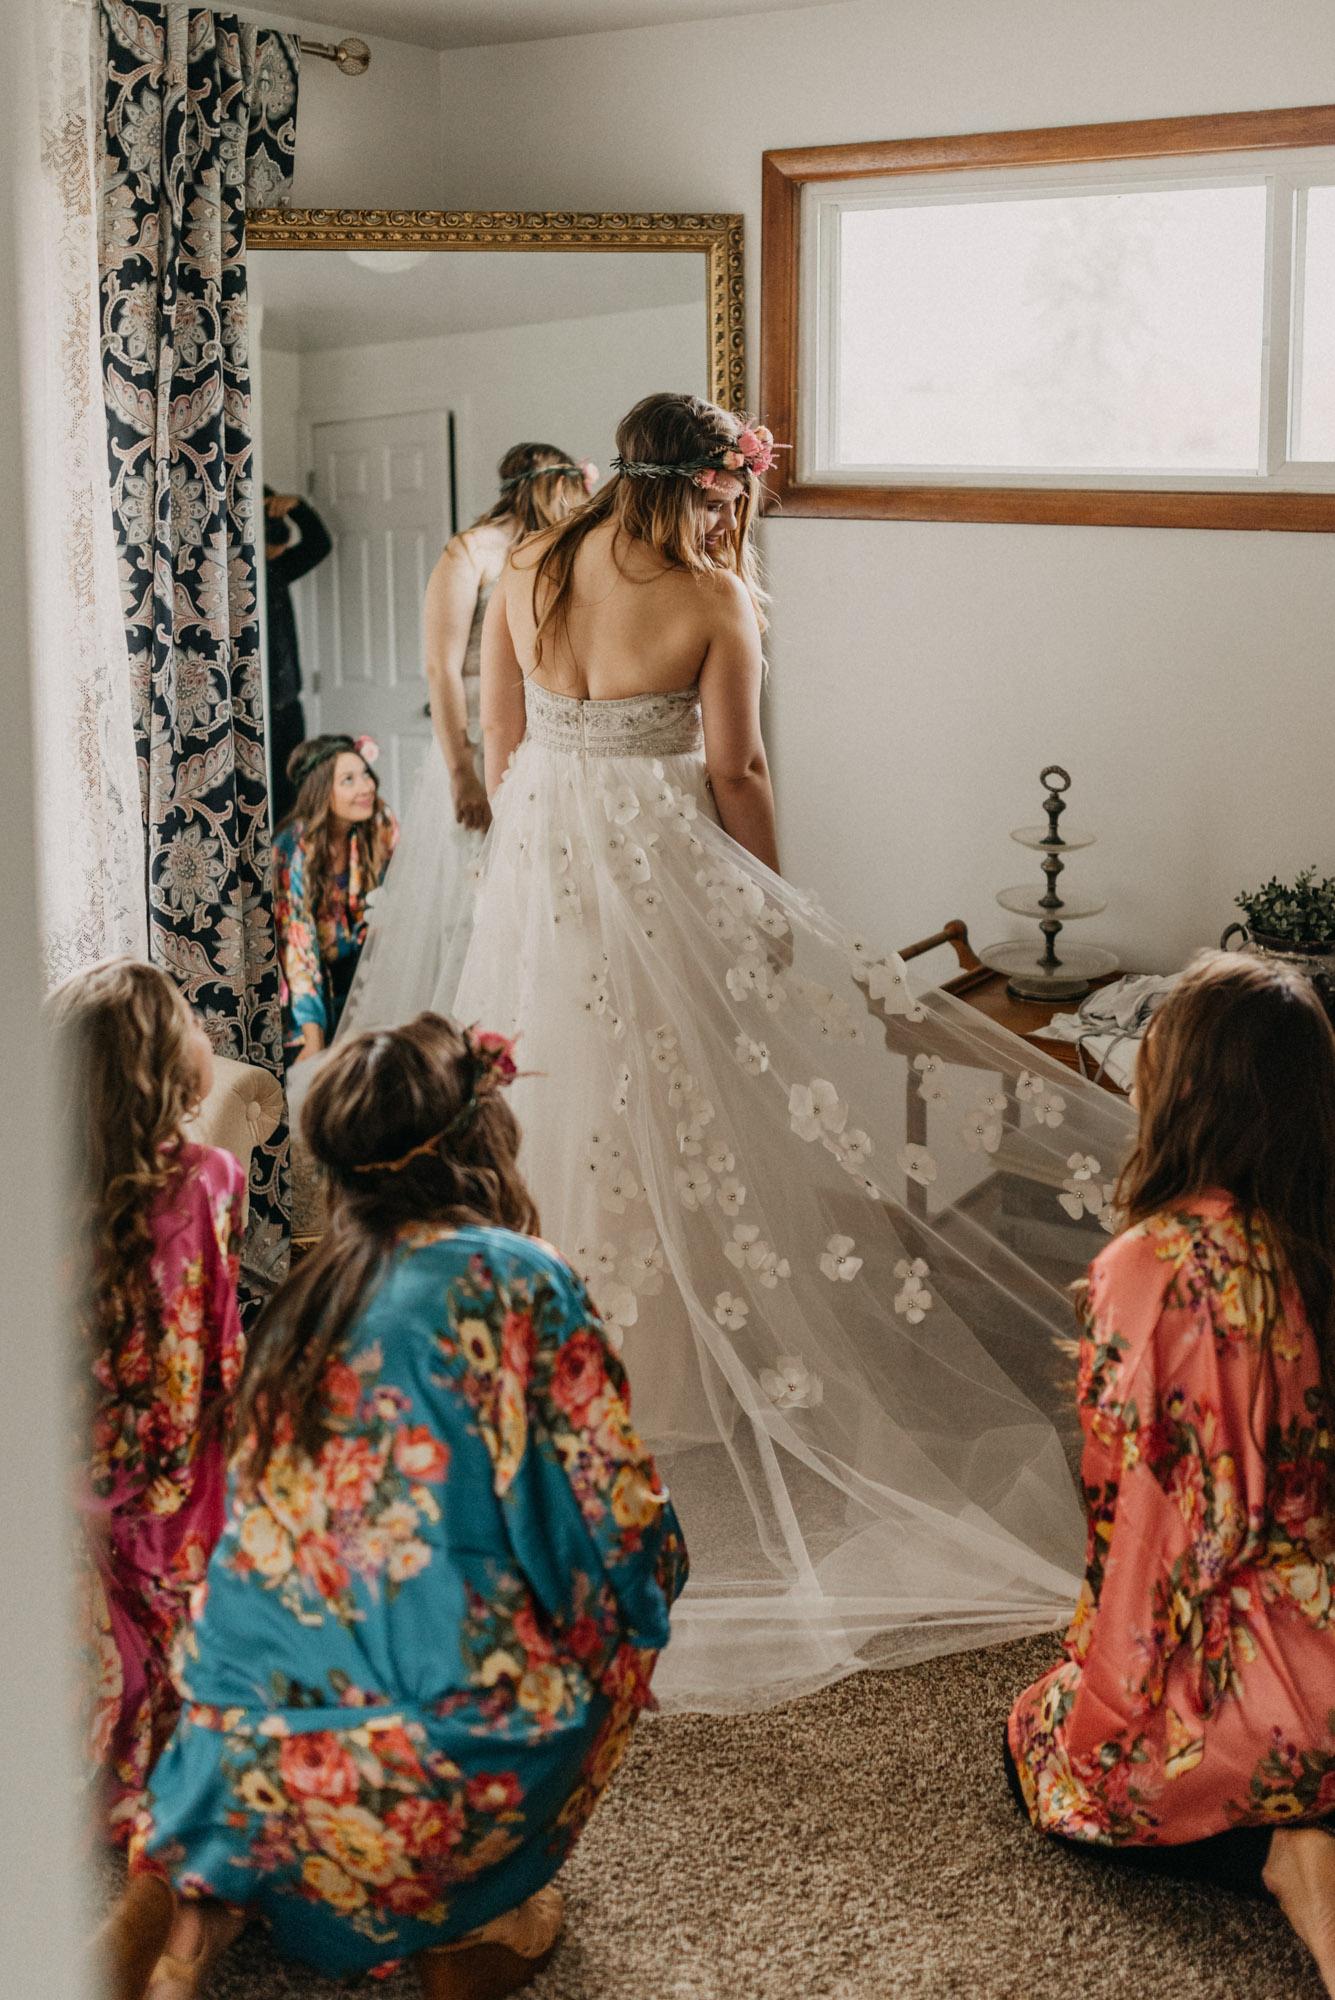 Getting-Ready-Swingset-Washington-Wedding-ringshot-8047.jpg